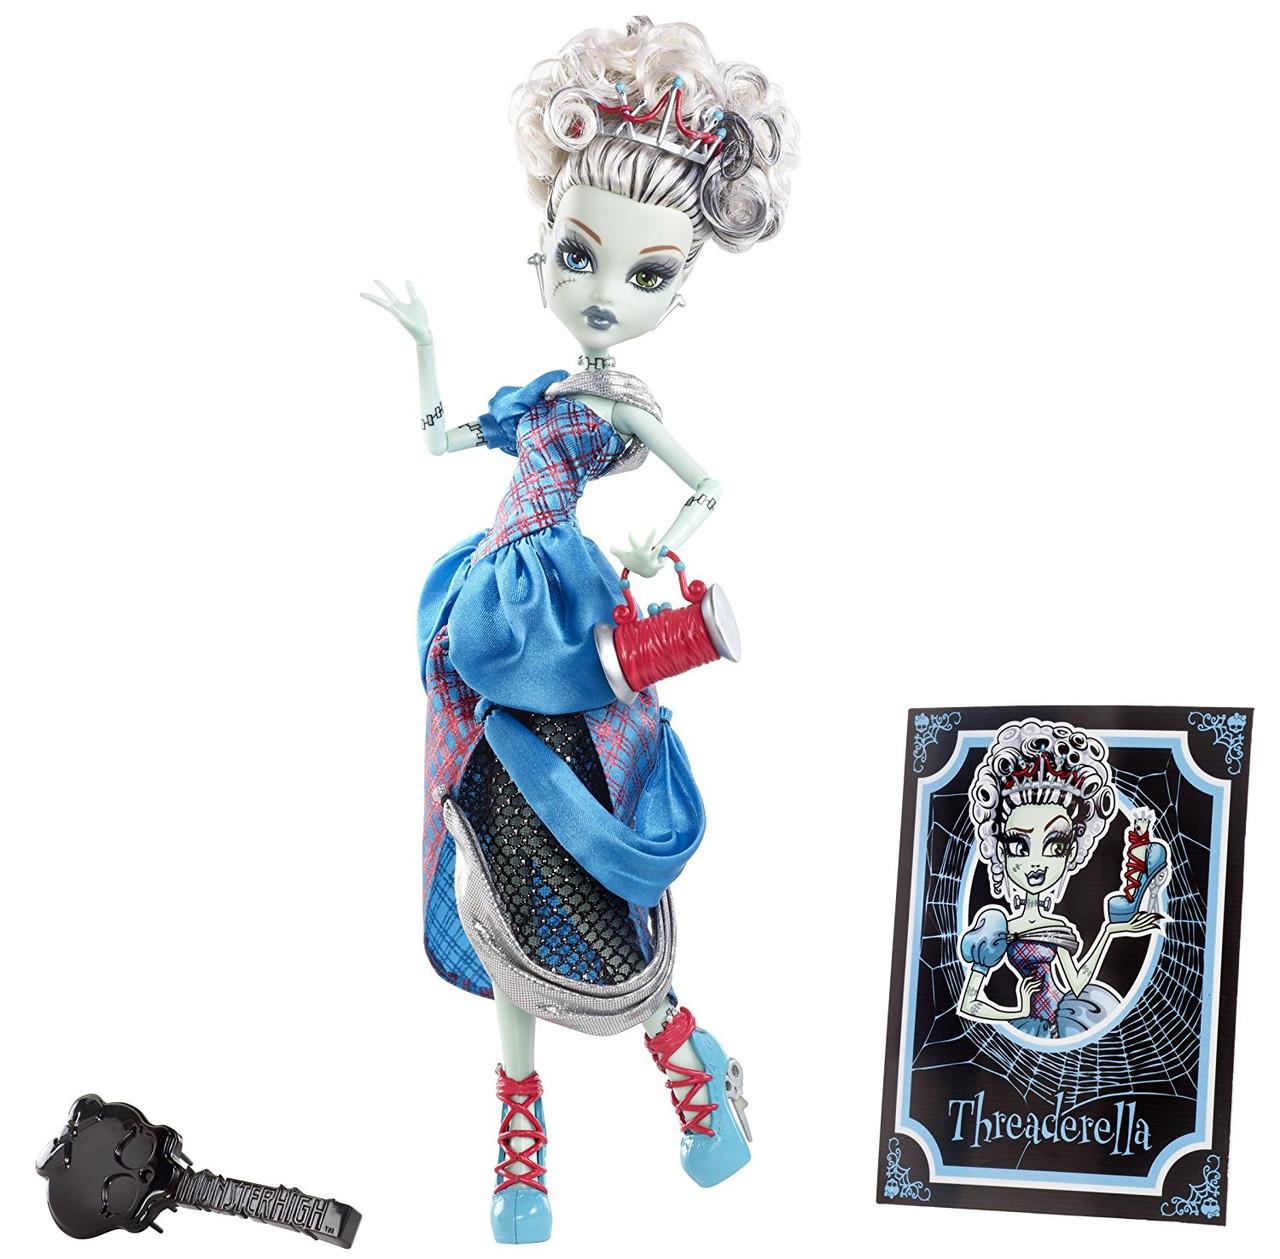 Monster High Frankie Stein Scary Tales Монстер Хай Френки Штейн Страшные Сказки